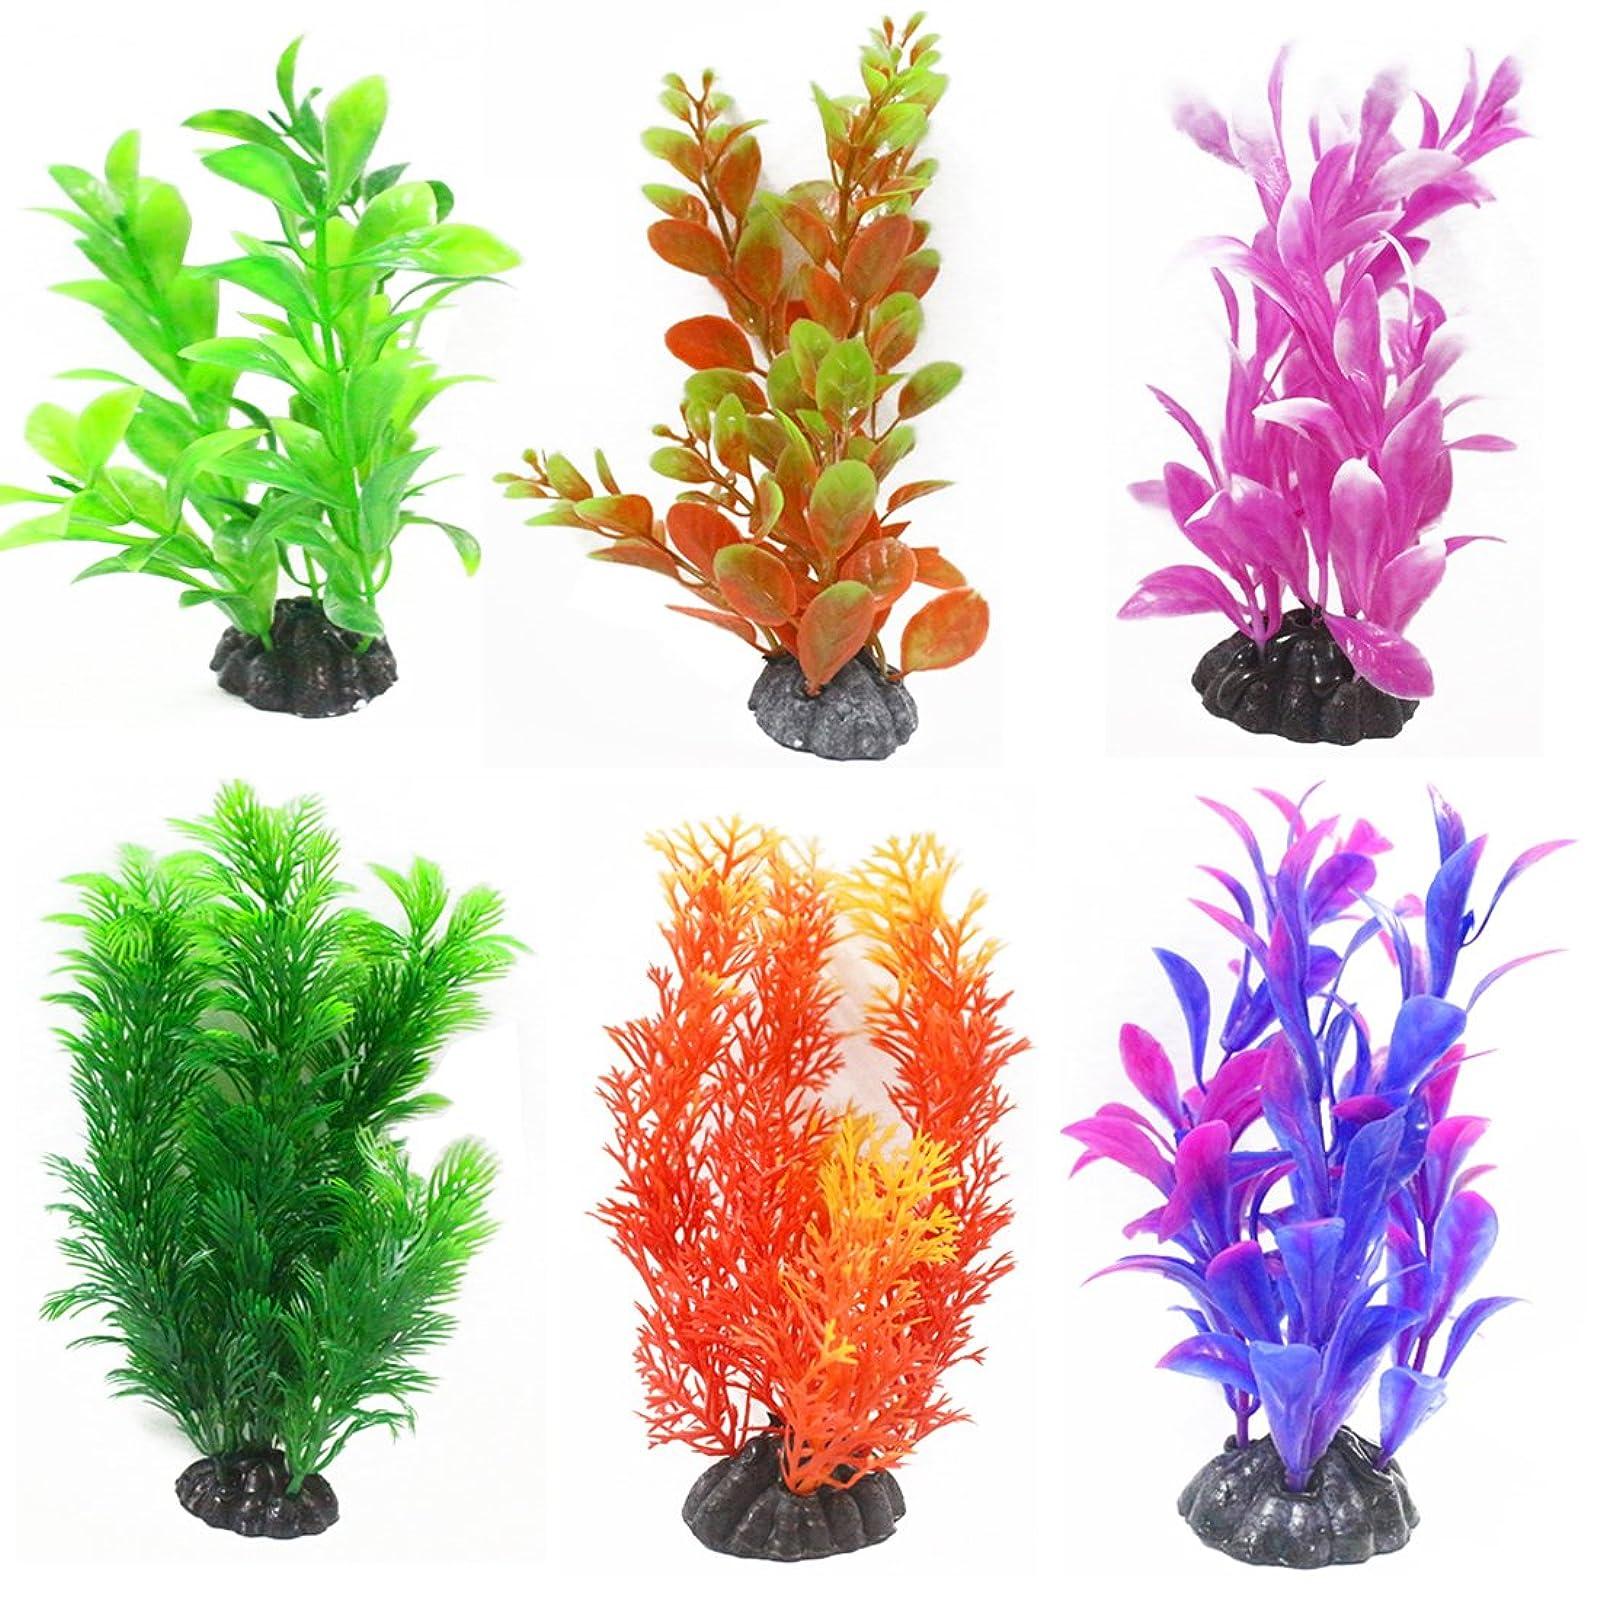 YOY Aquarium Decor Fish Tank Decoration Ornament - 8